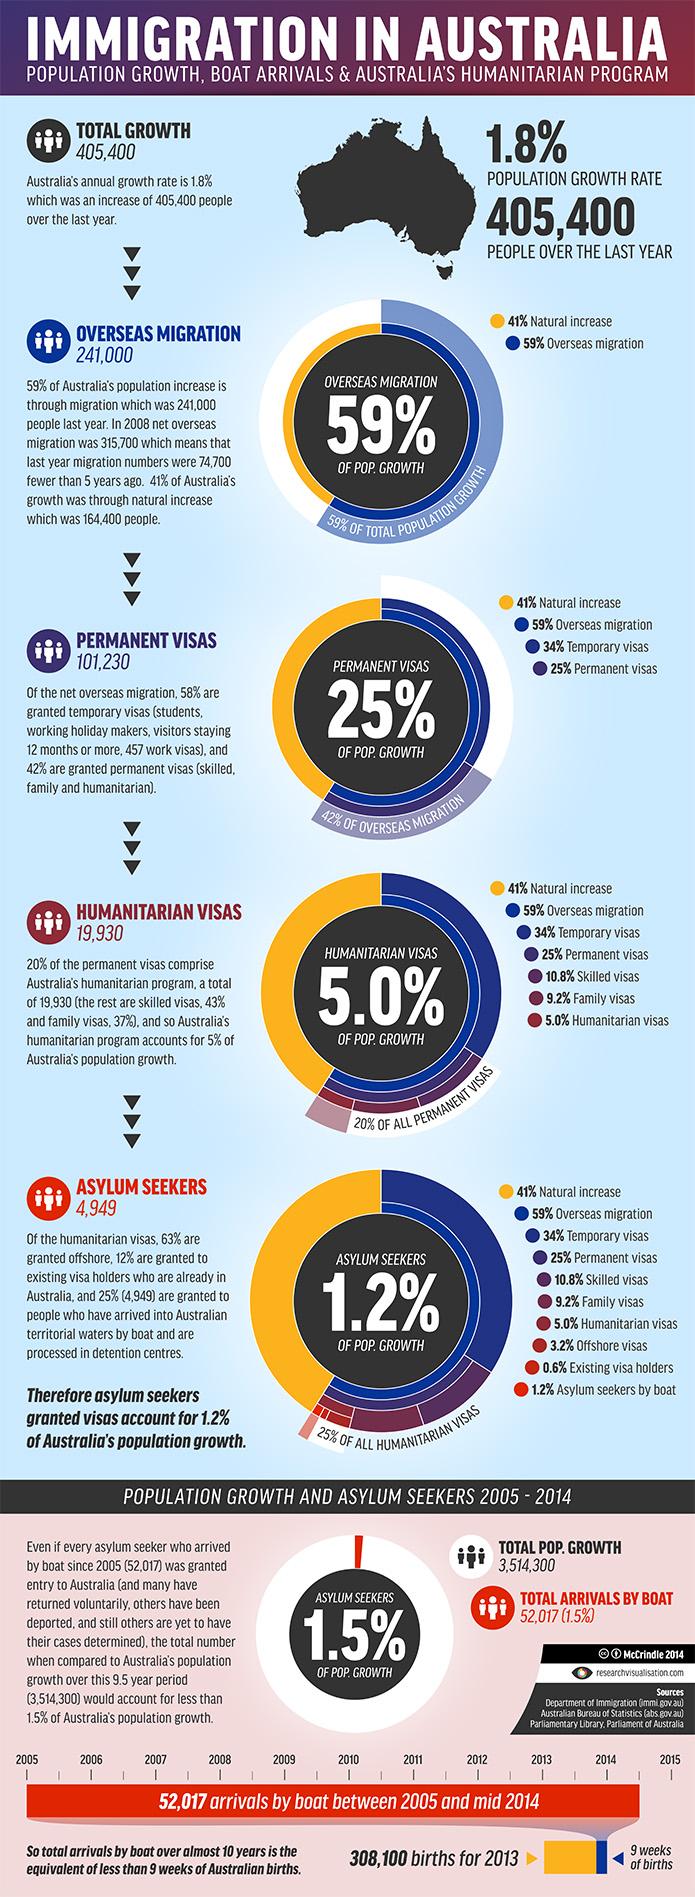 Immigration-in-Australia_Infographic_McCrindle_Full